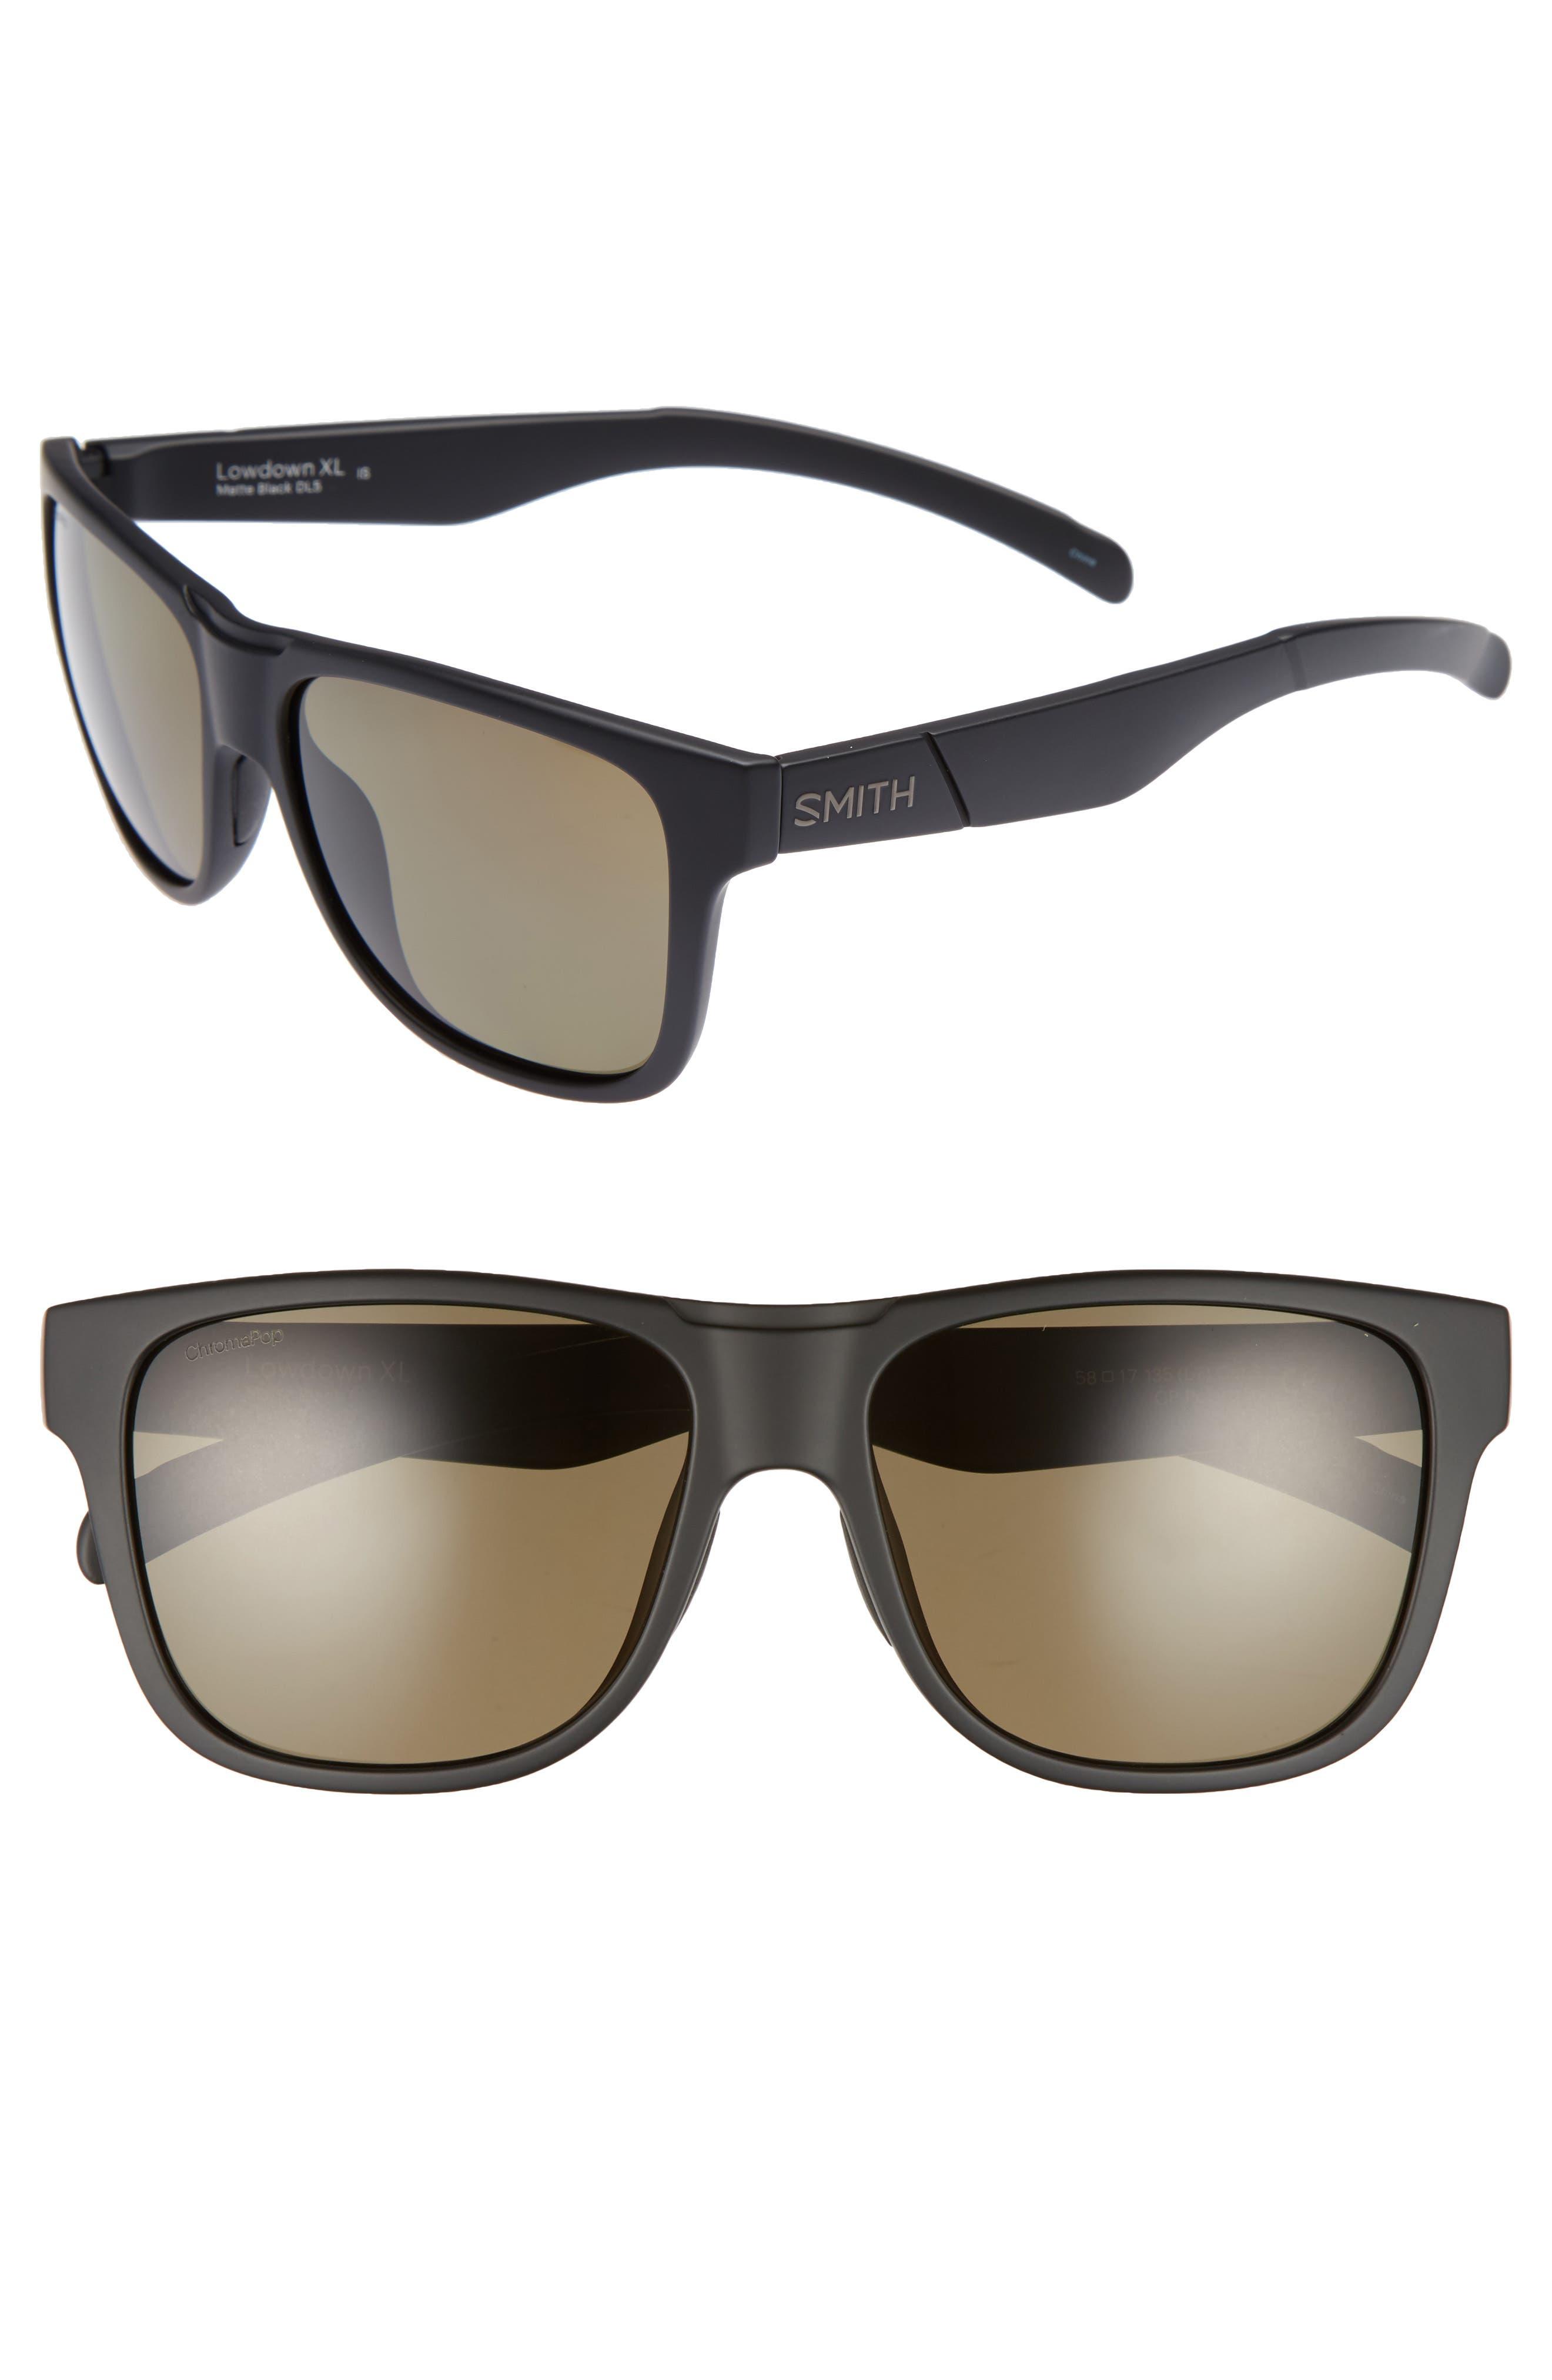 Lowdown XL 58mm Polarized Sunglasses,                             Main thumbnail 1, color,                             001